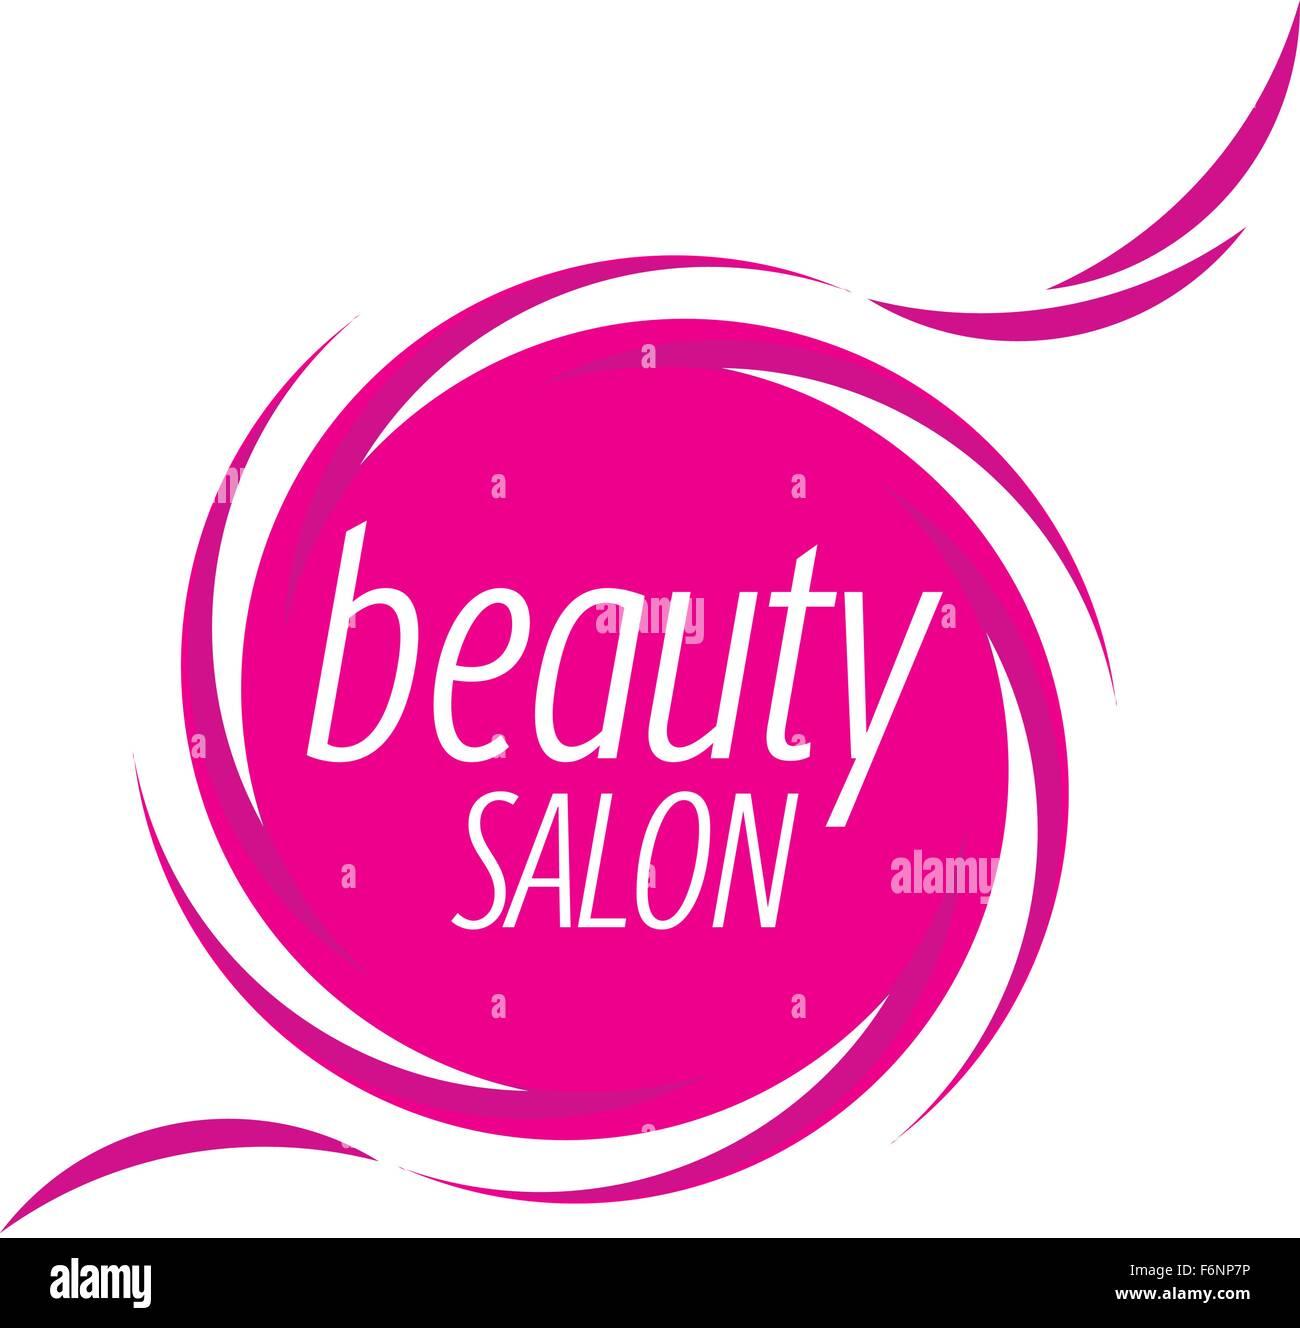 Logo beauty salon stock vector art illustration vector image logo beauty salon altavistaventures Images